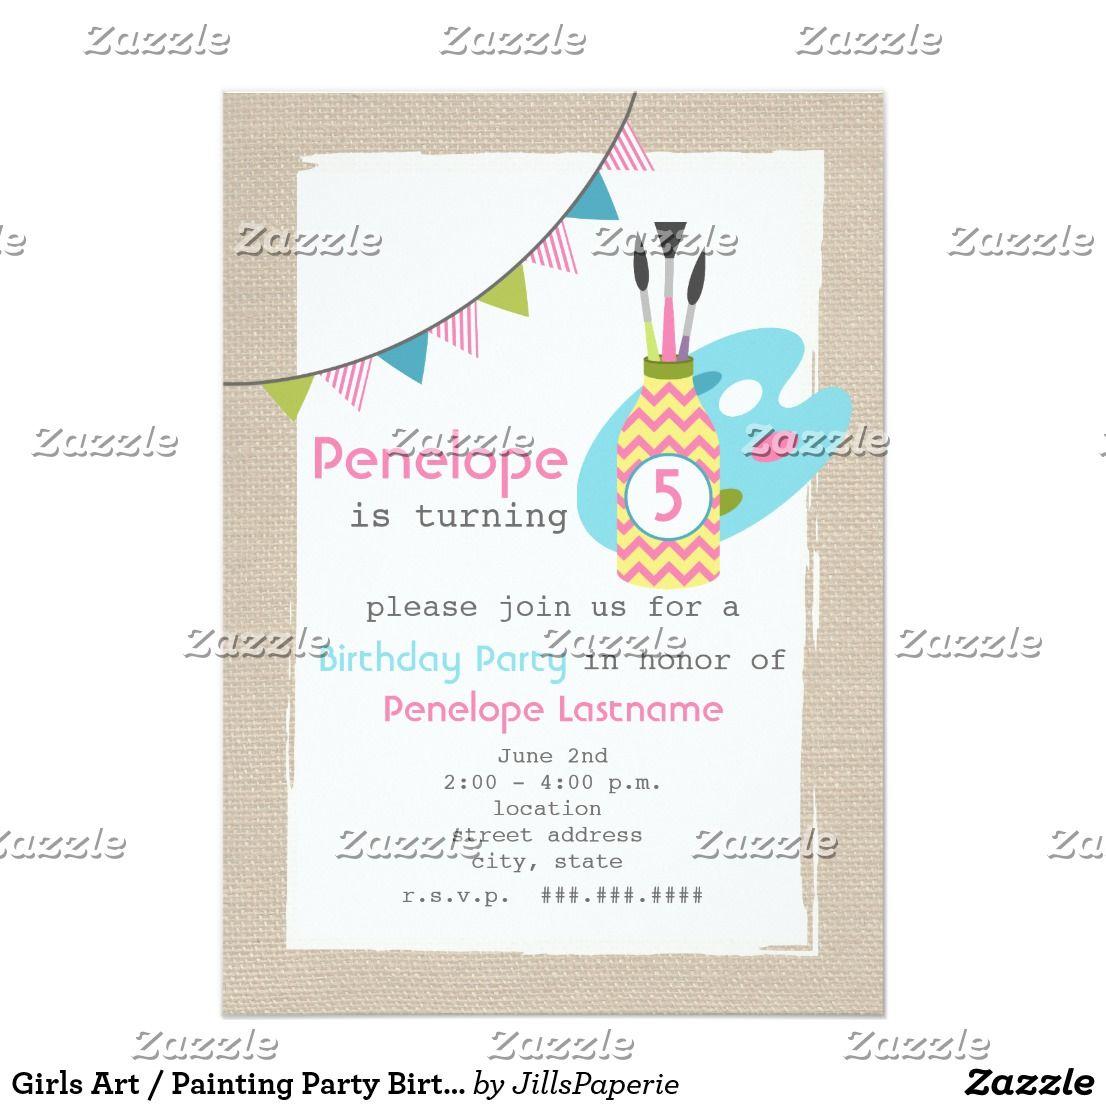 Girls Art / Painting Party Birthday Invitation | Birthdays